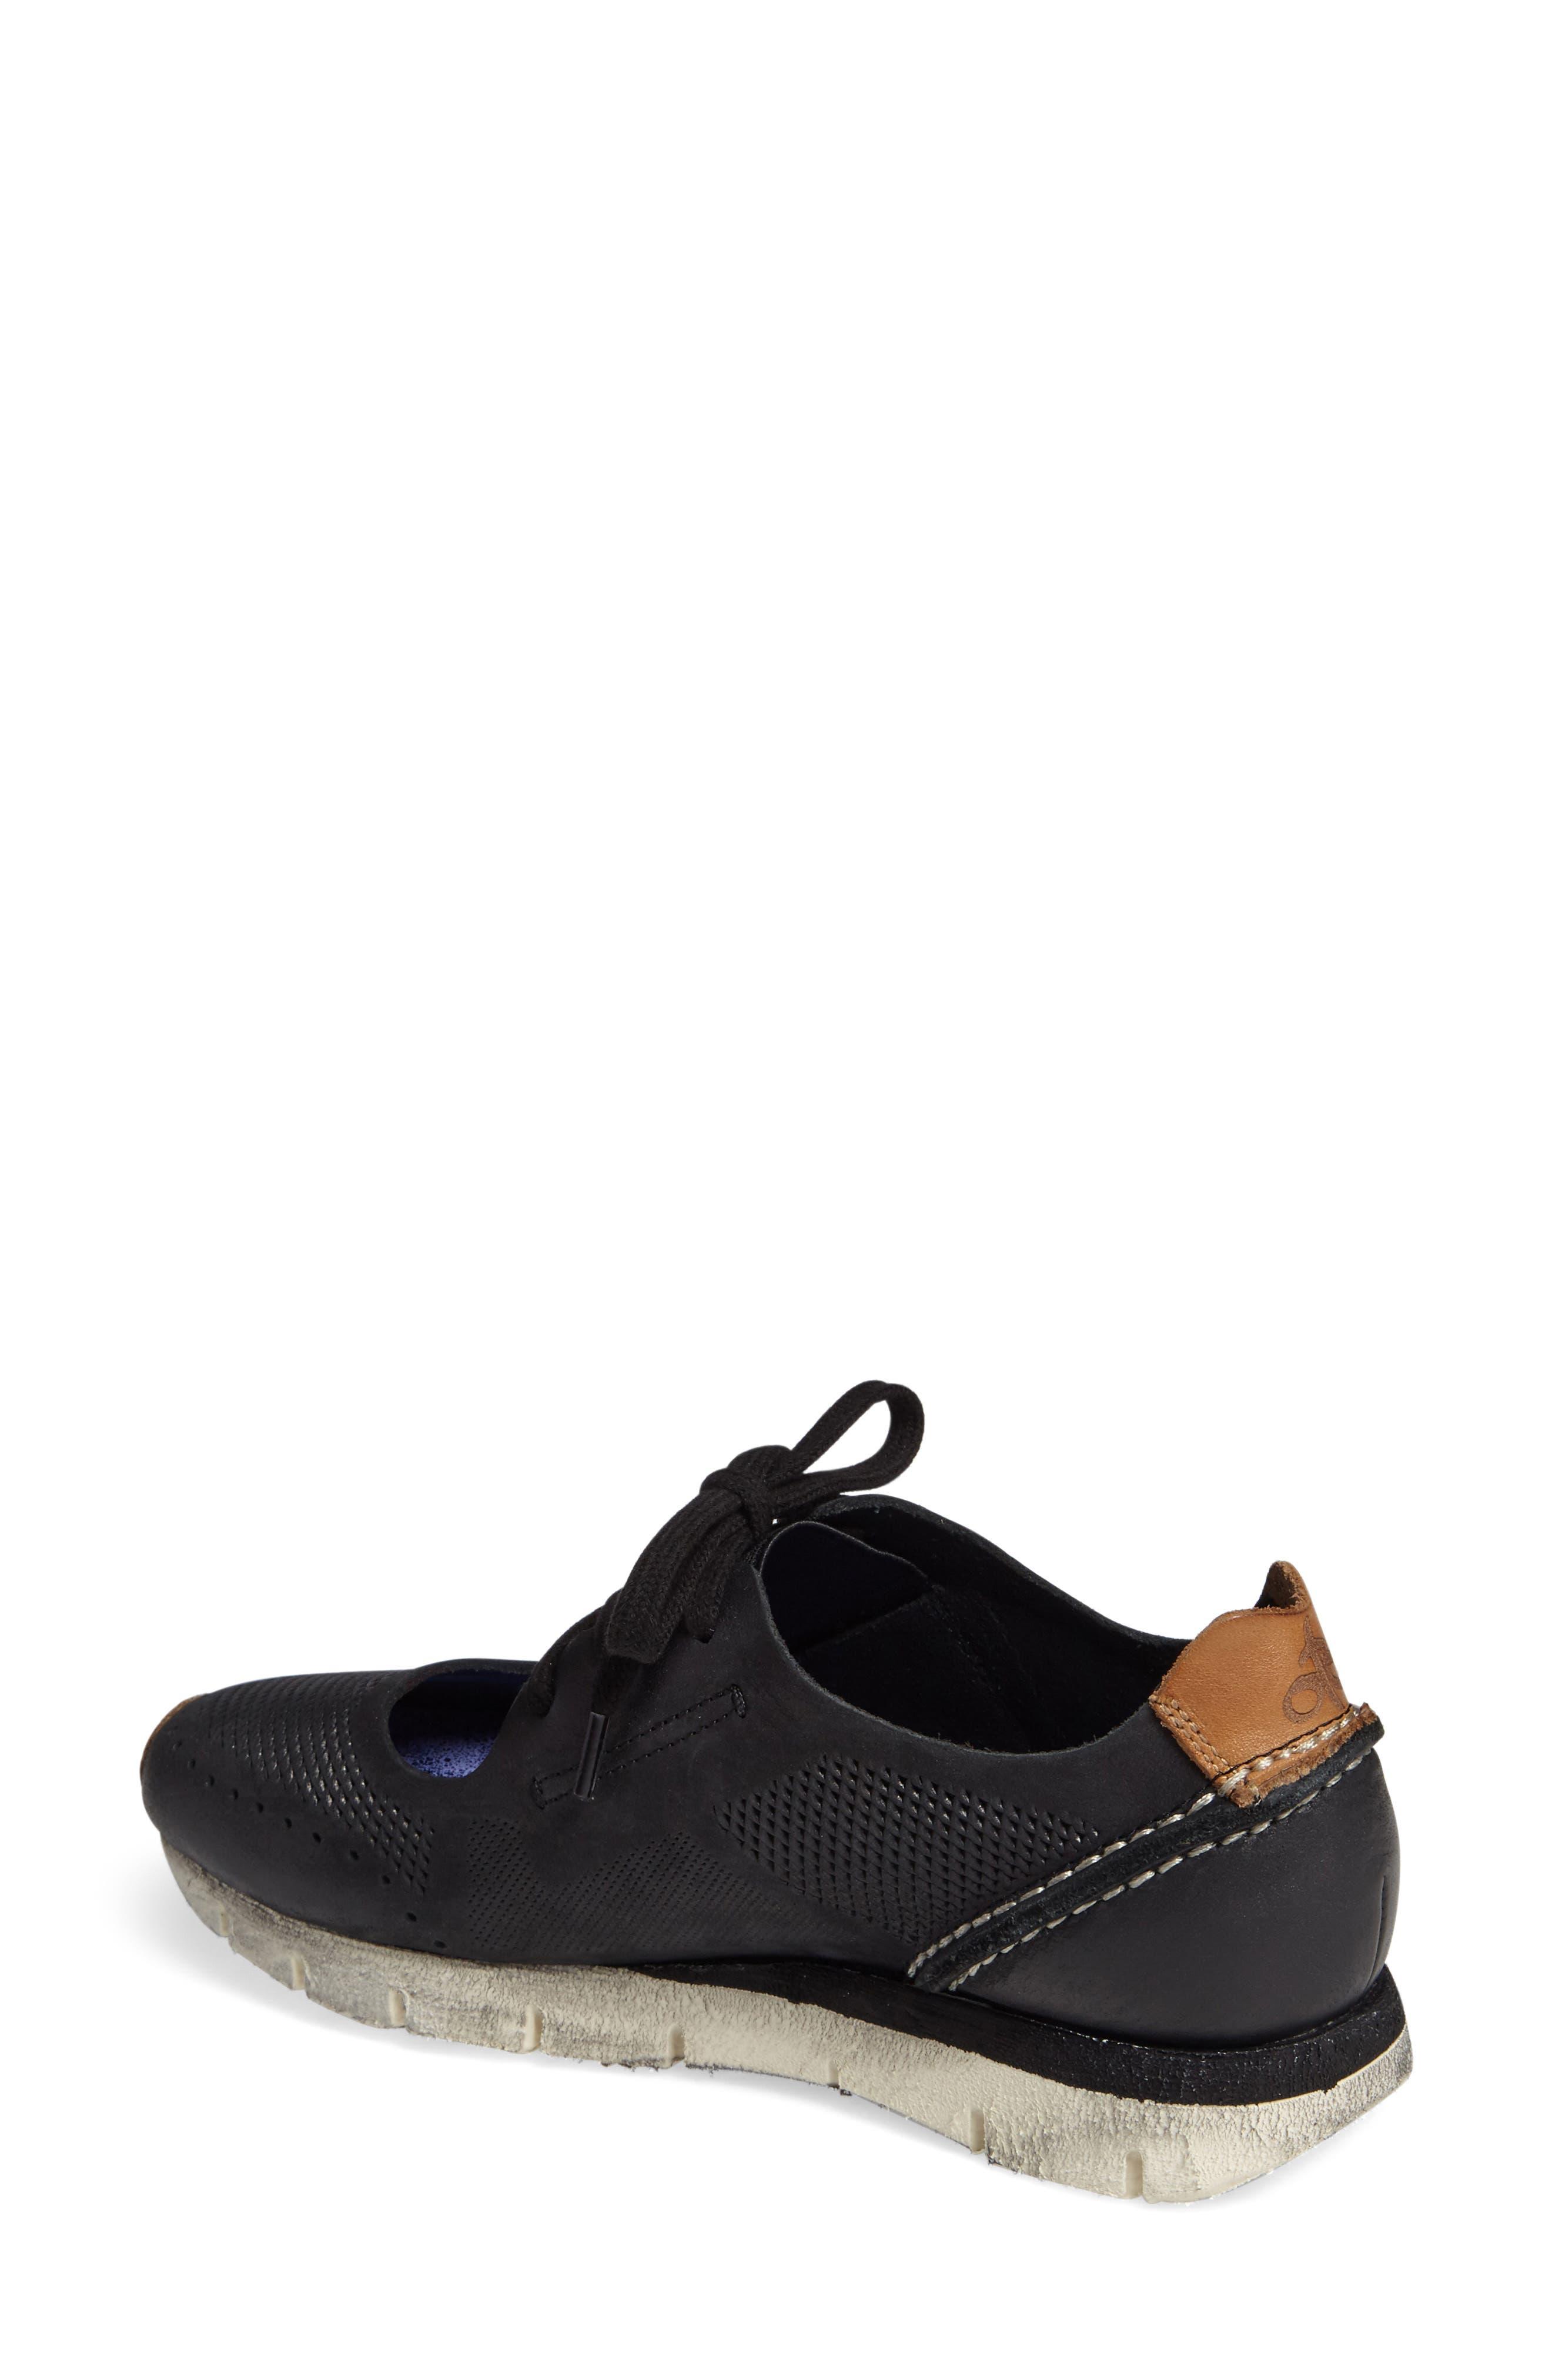 Star Dust Cutout Sneaker,                             Alternate thumbnail 2, color,                             BLACK LEATHER